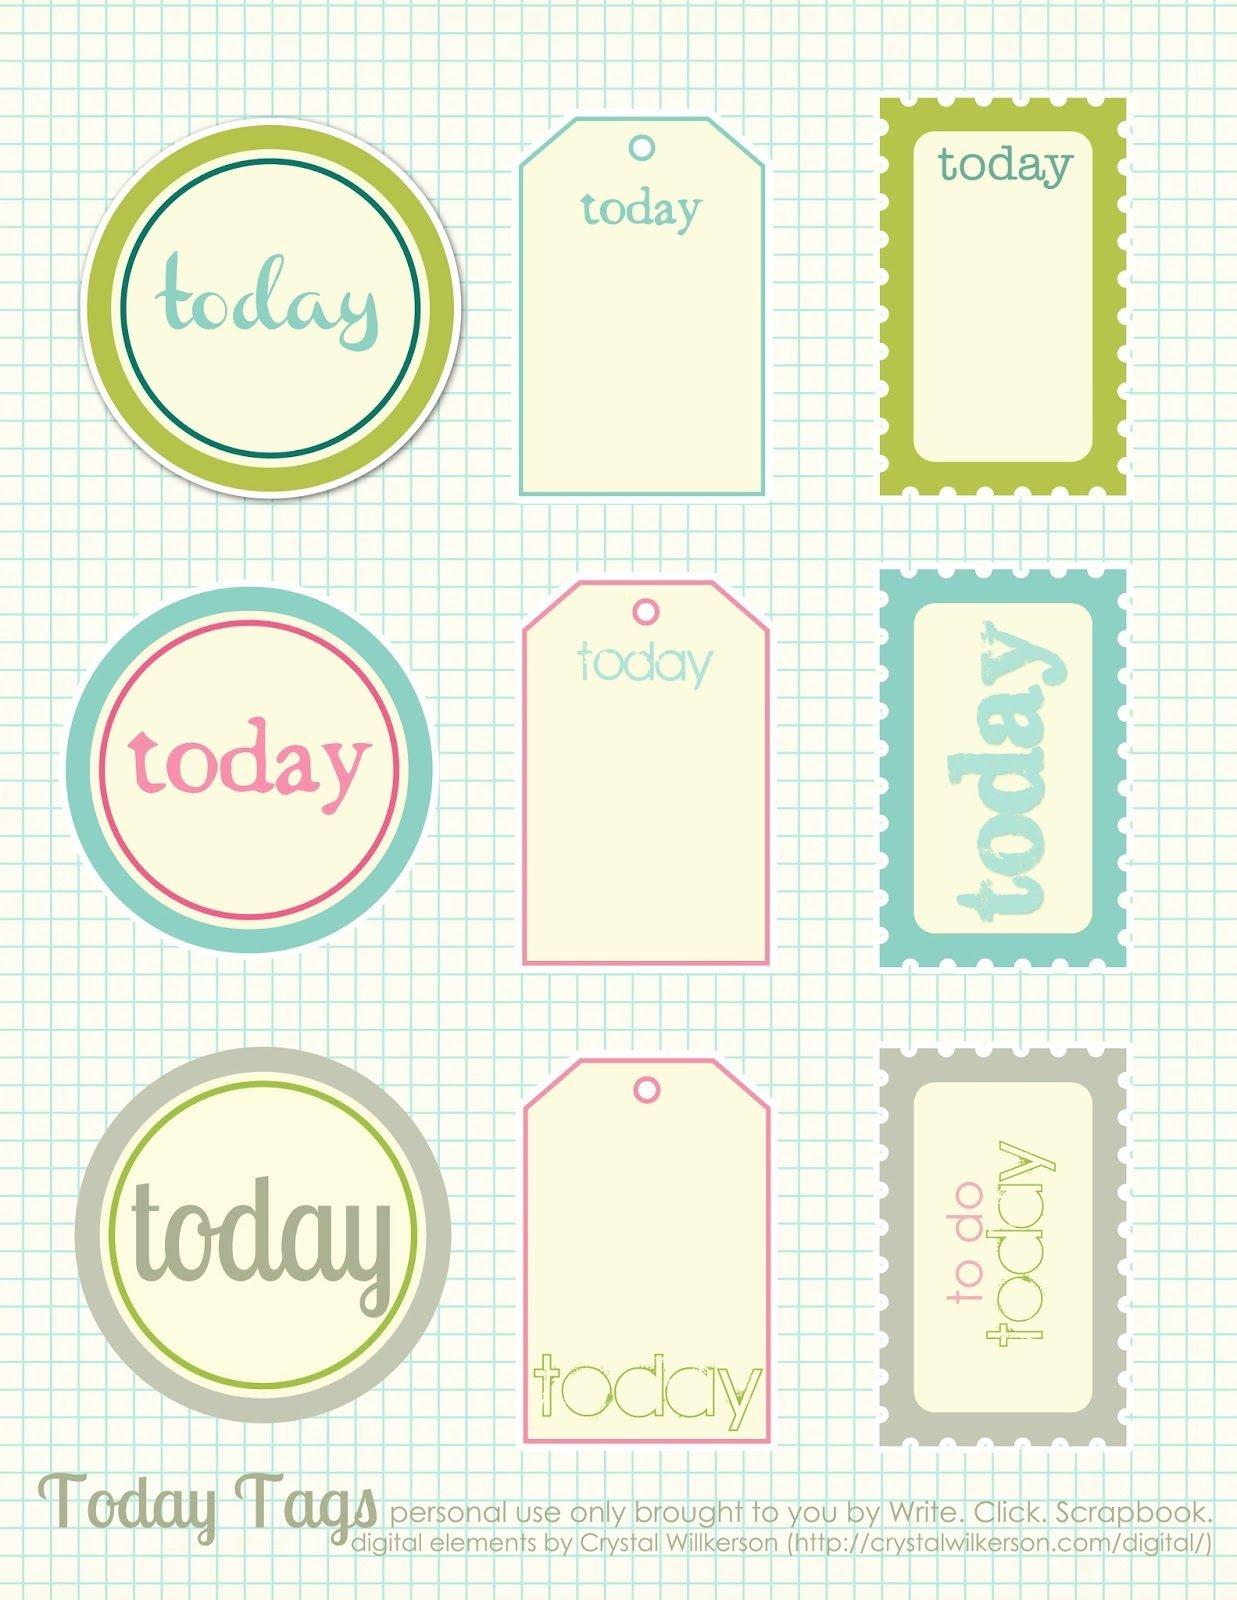 Free Printable Scrapbook Cutouts   Printable For All Topics - Free Printable Scrapbook Templates